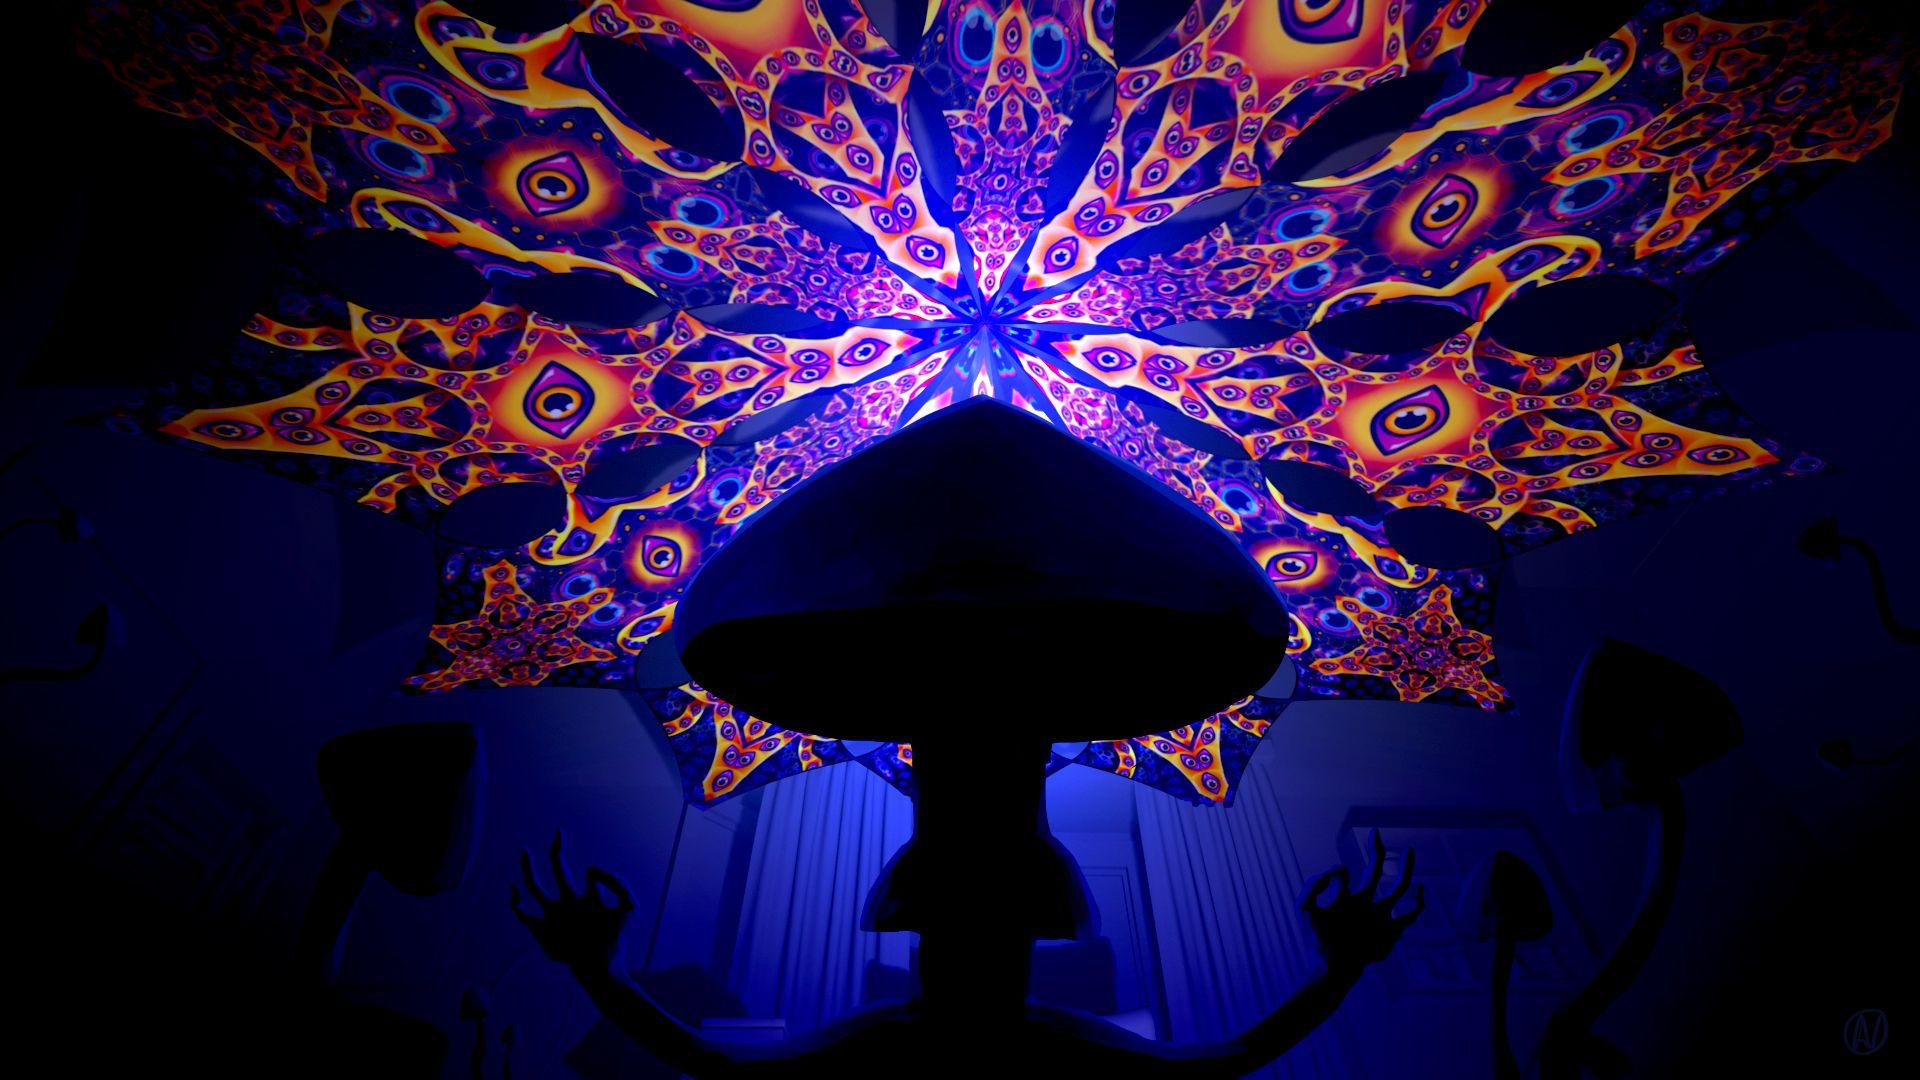 mushrooms screensaver pictures